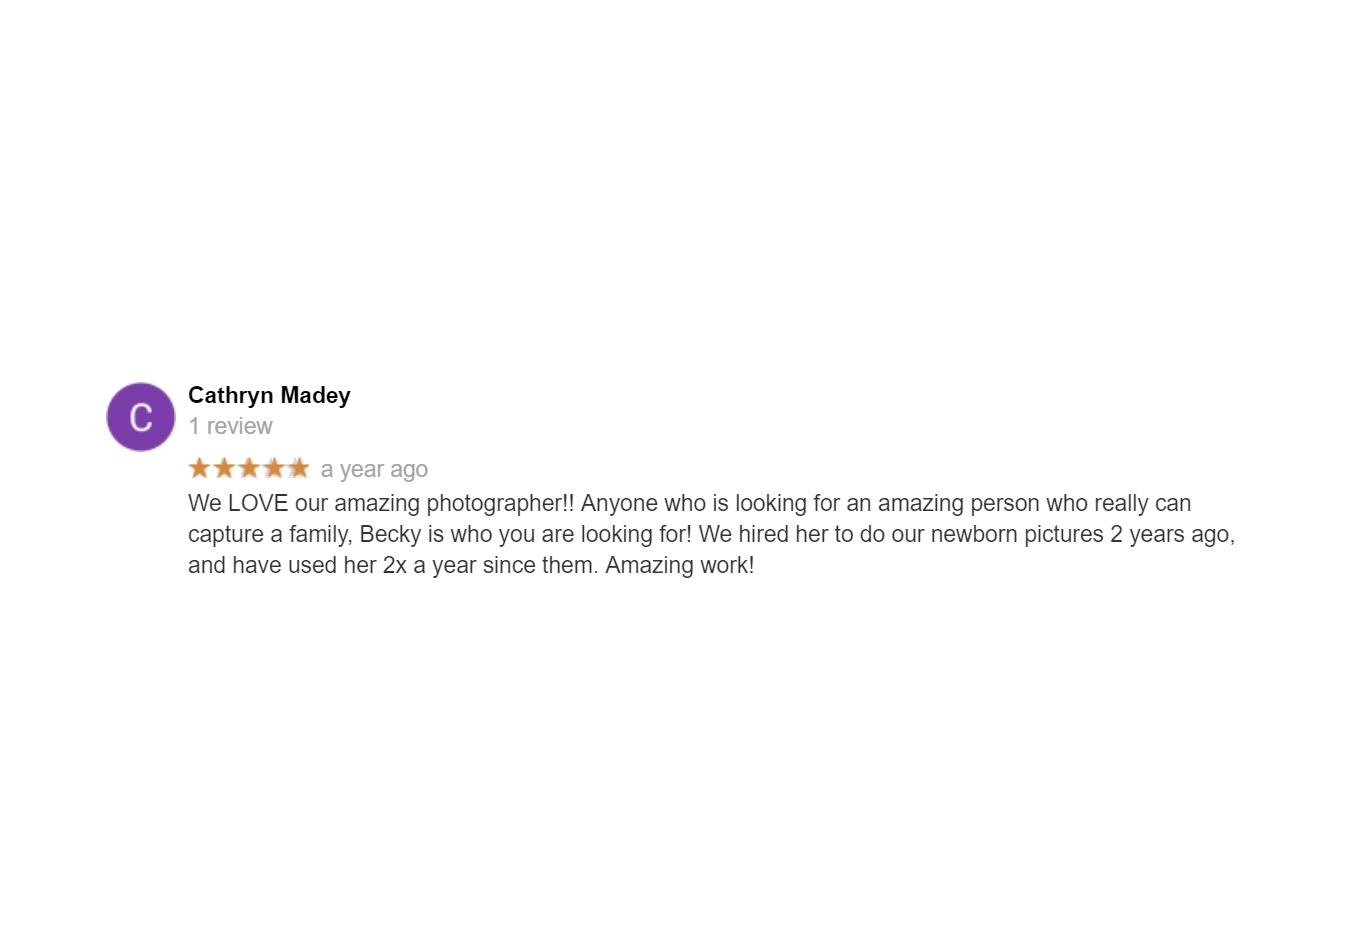 reviews_0009_Layer 59.jpg